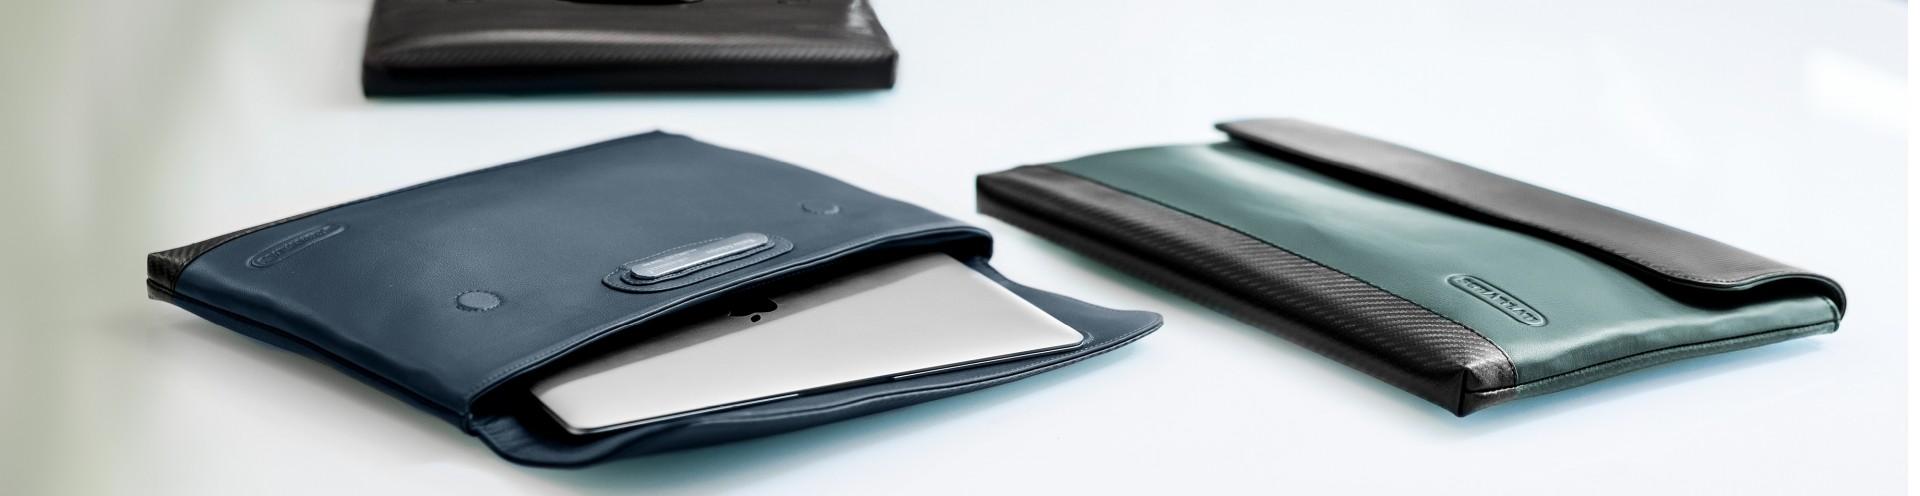 Customizable Leather Tech Accessories